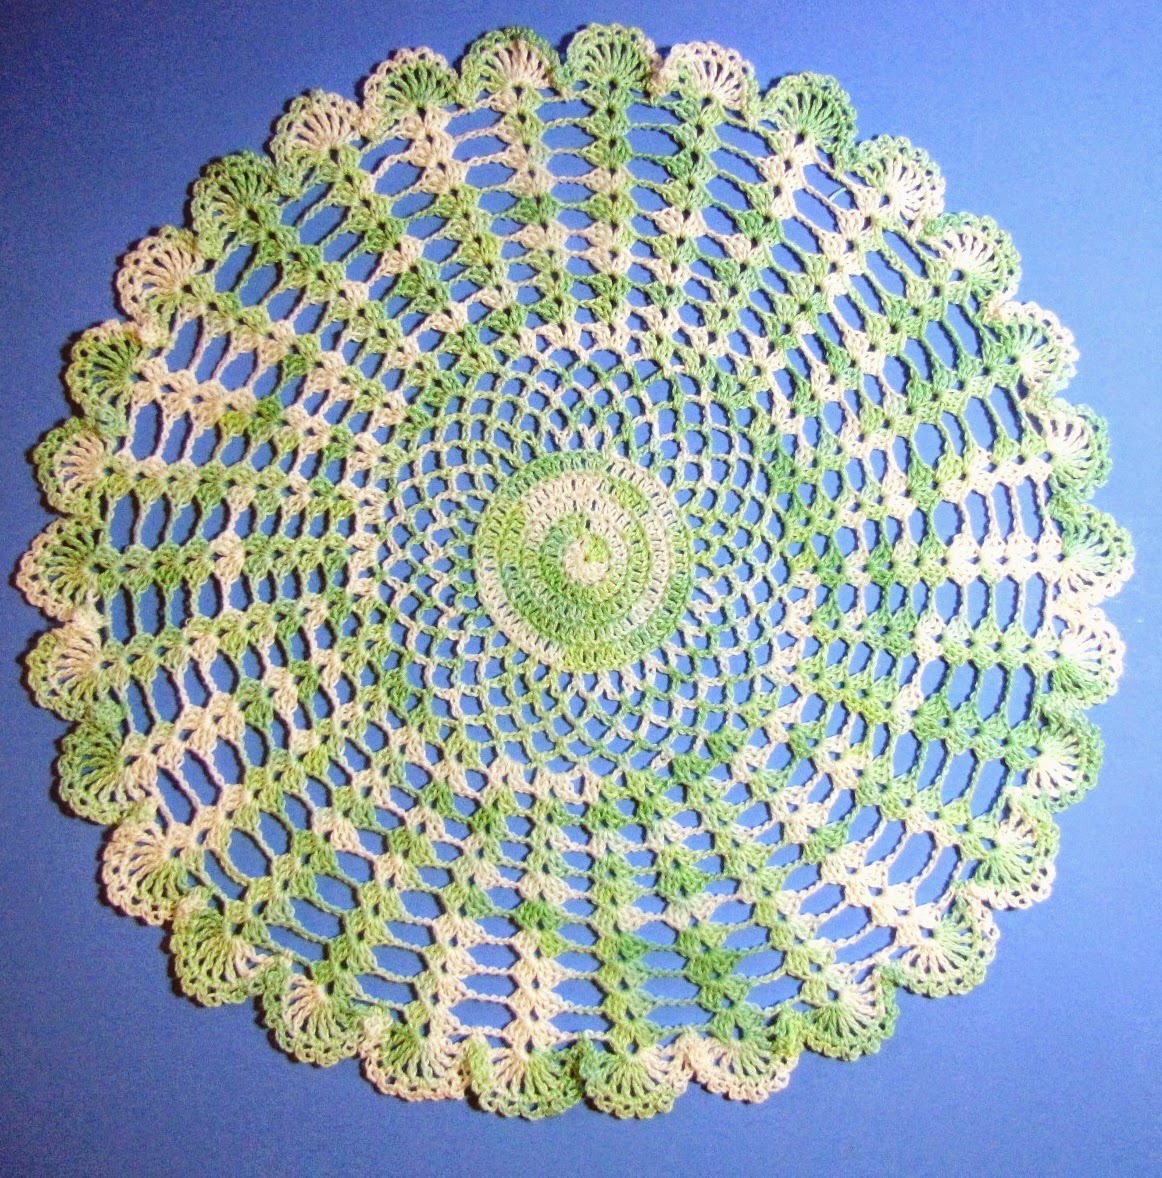 Bellacrochet Easter Garden Doily A Free Crochet Pattern For You With Butterflies Circular